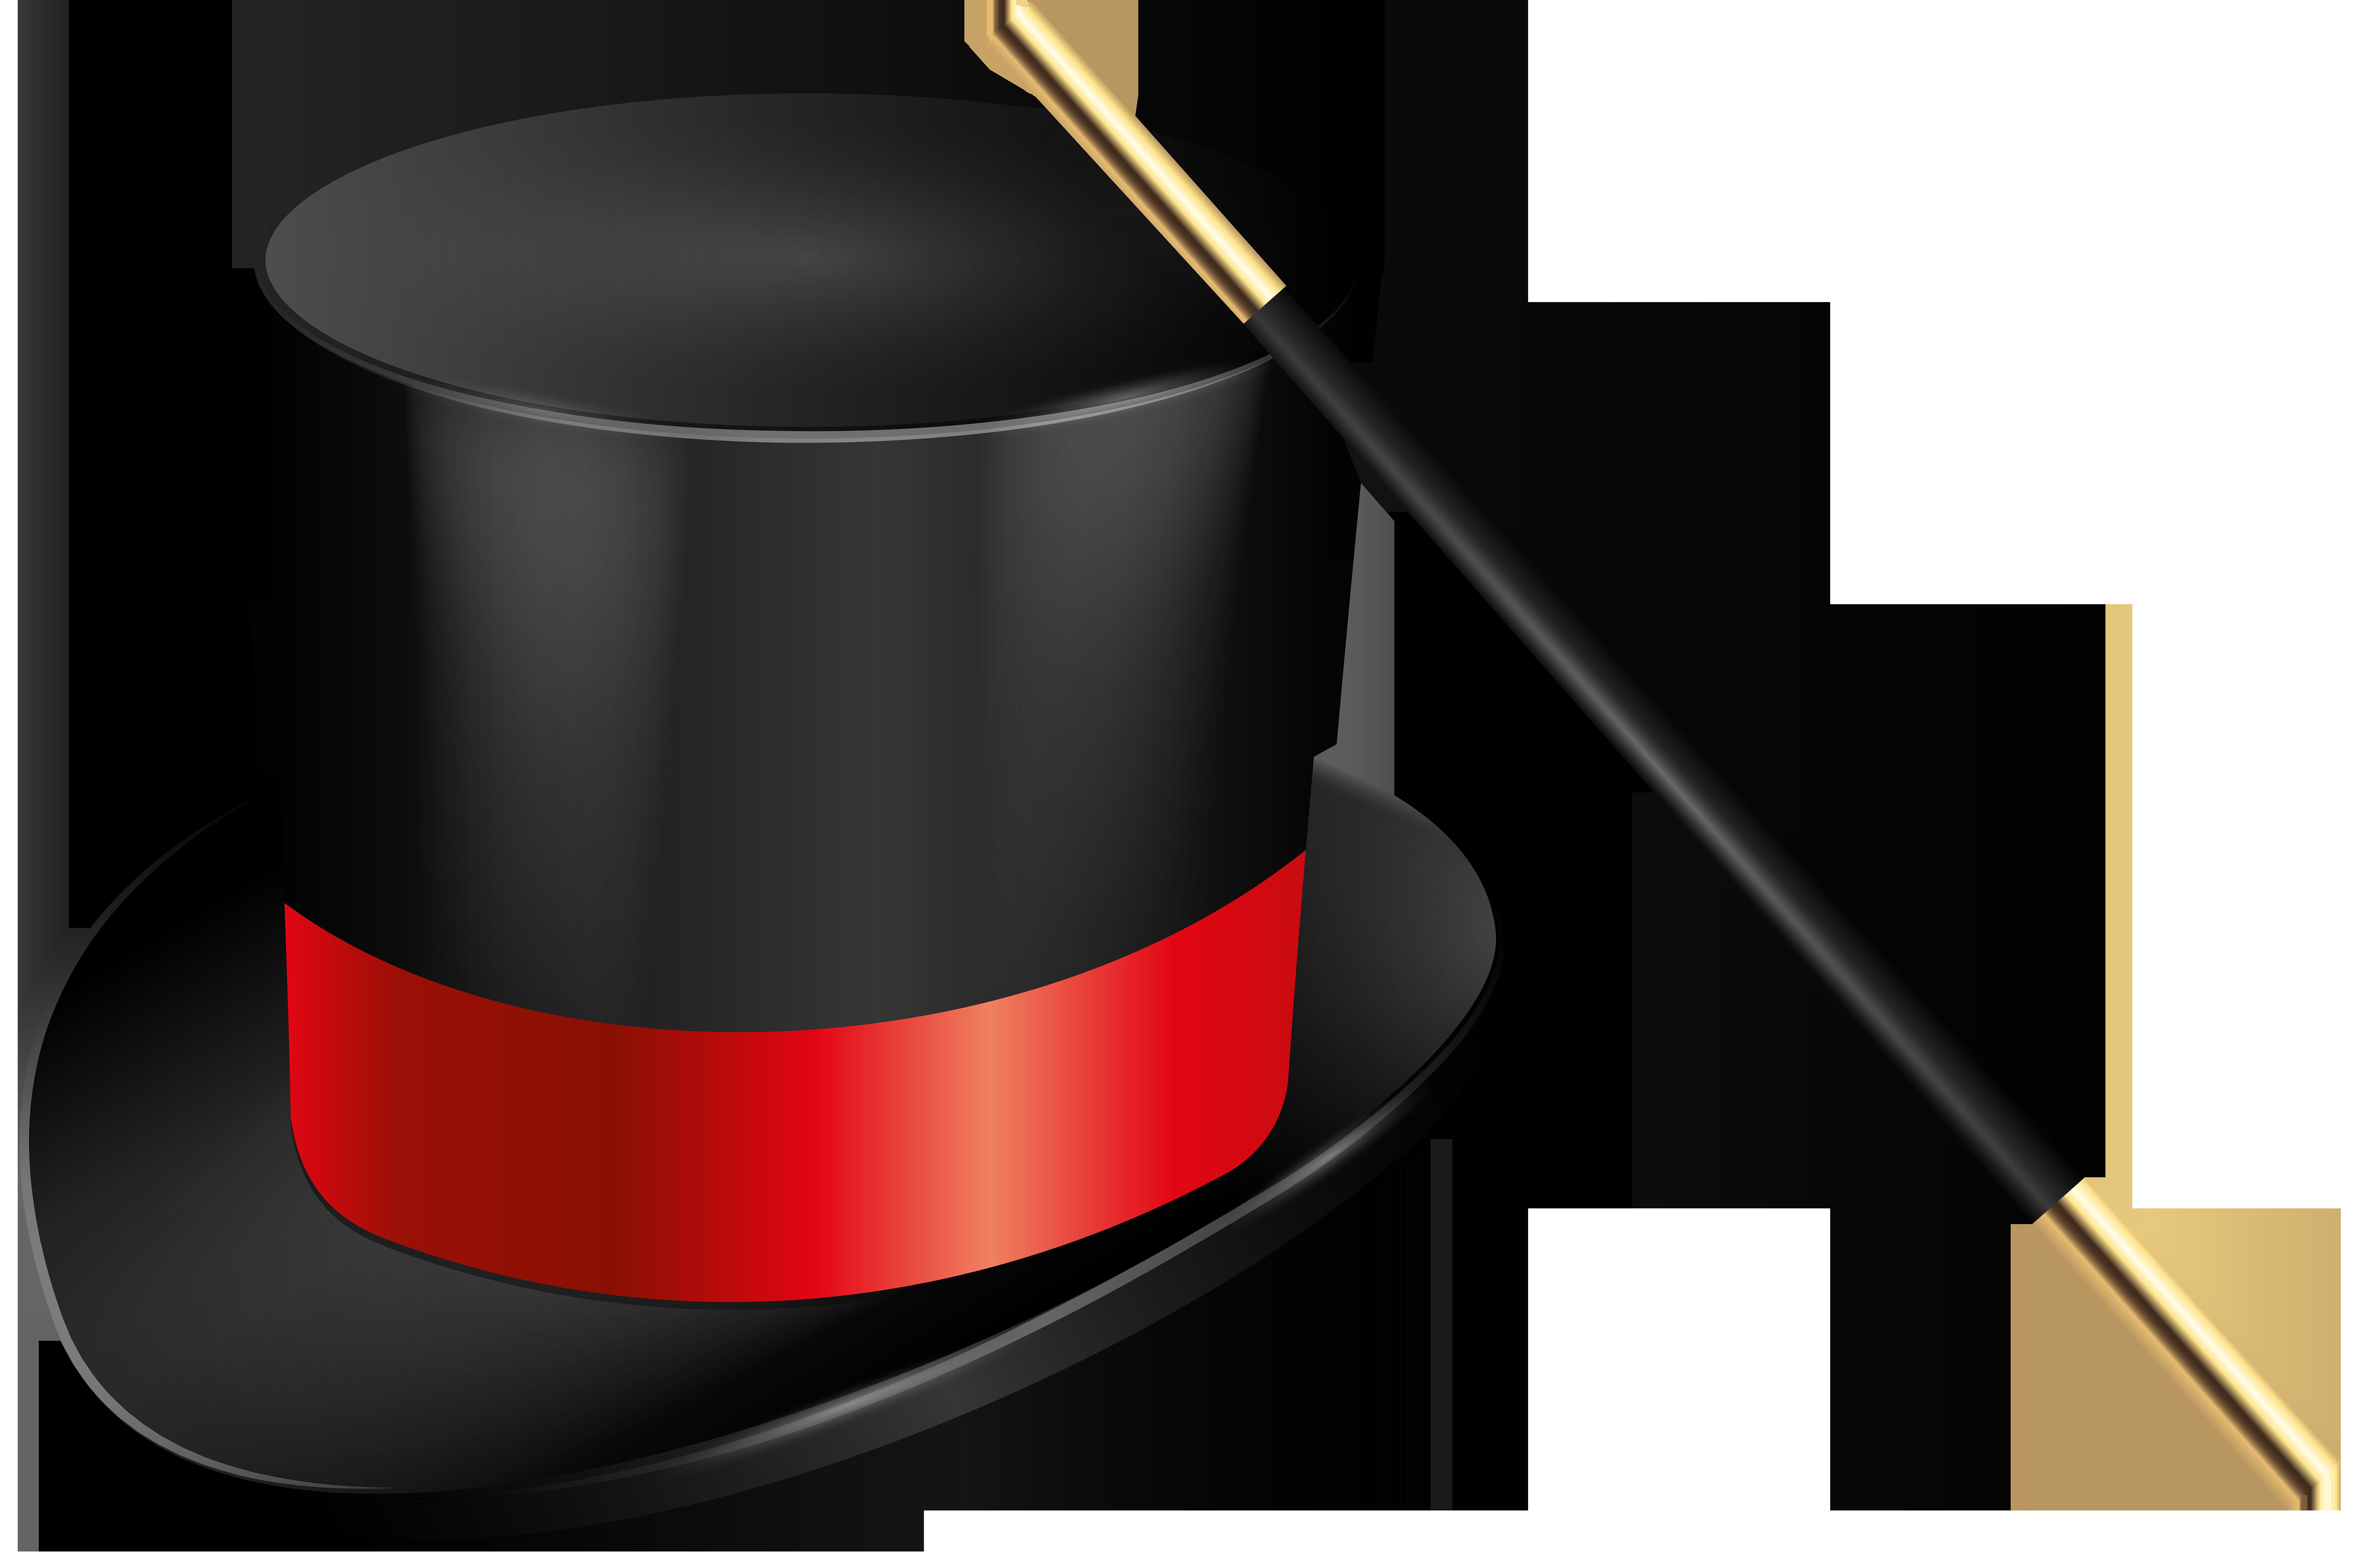 8000x5315 Magic Hat And Magic Wand Png Clip Art Imageu200b Gallery